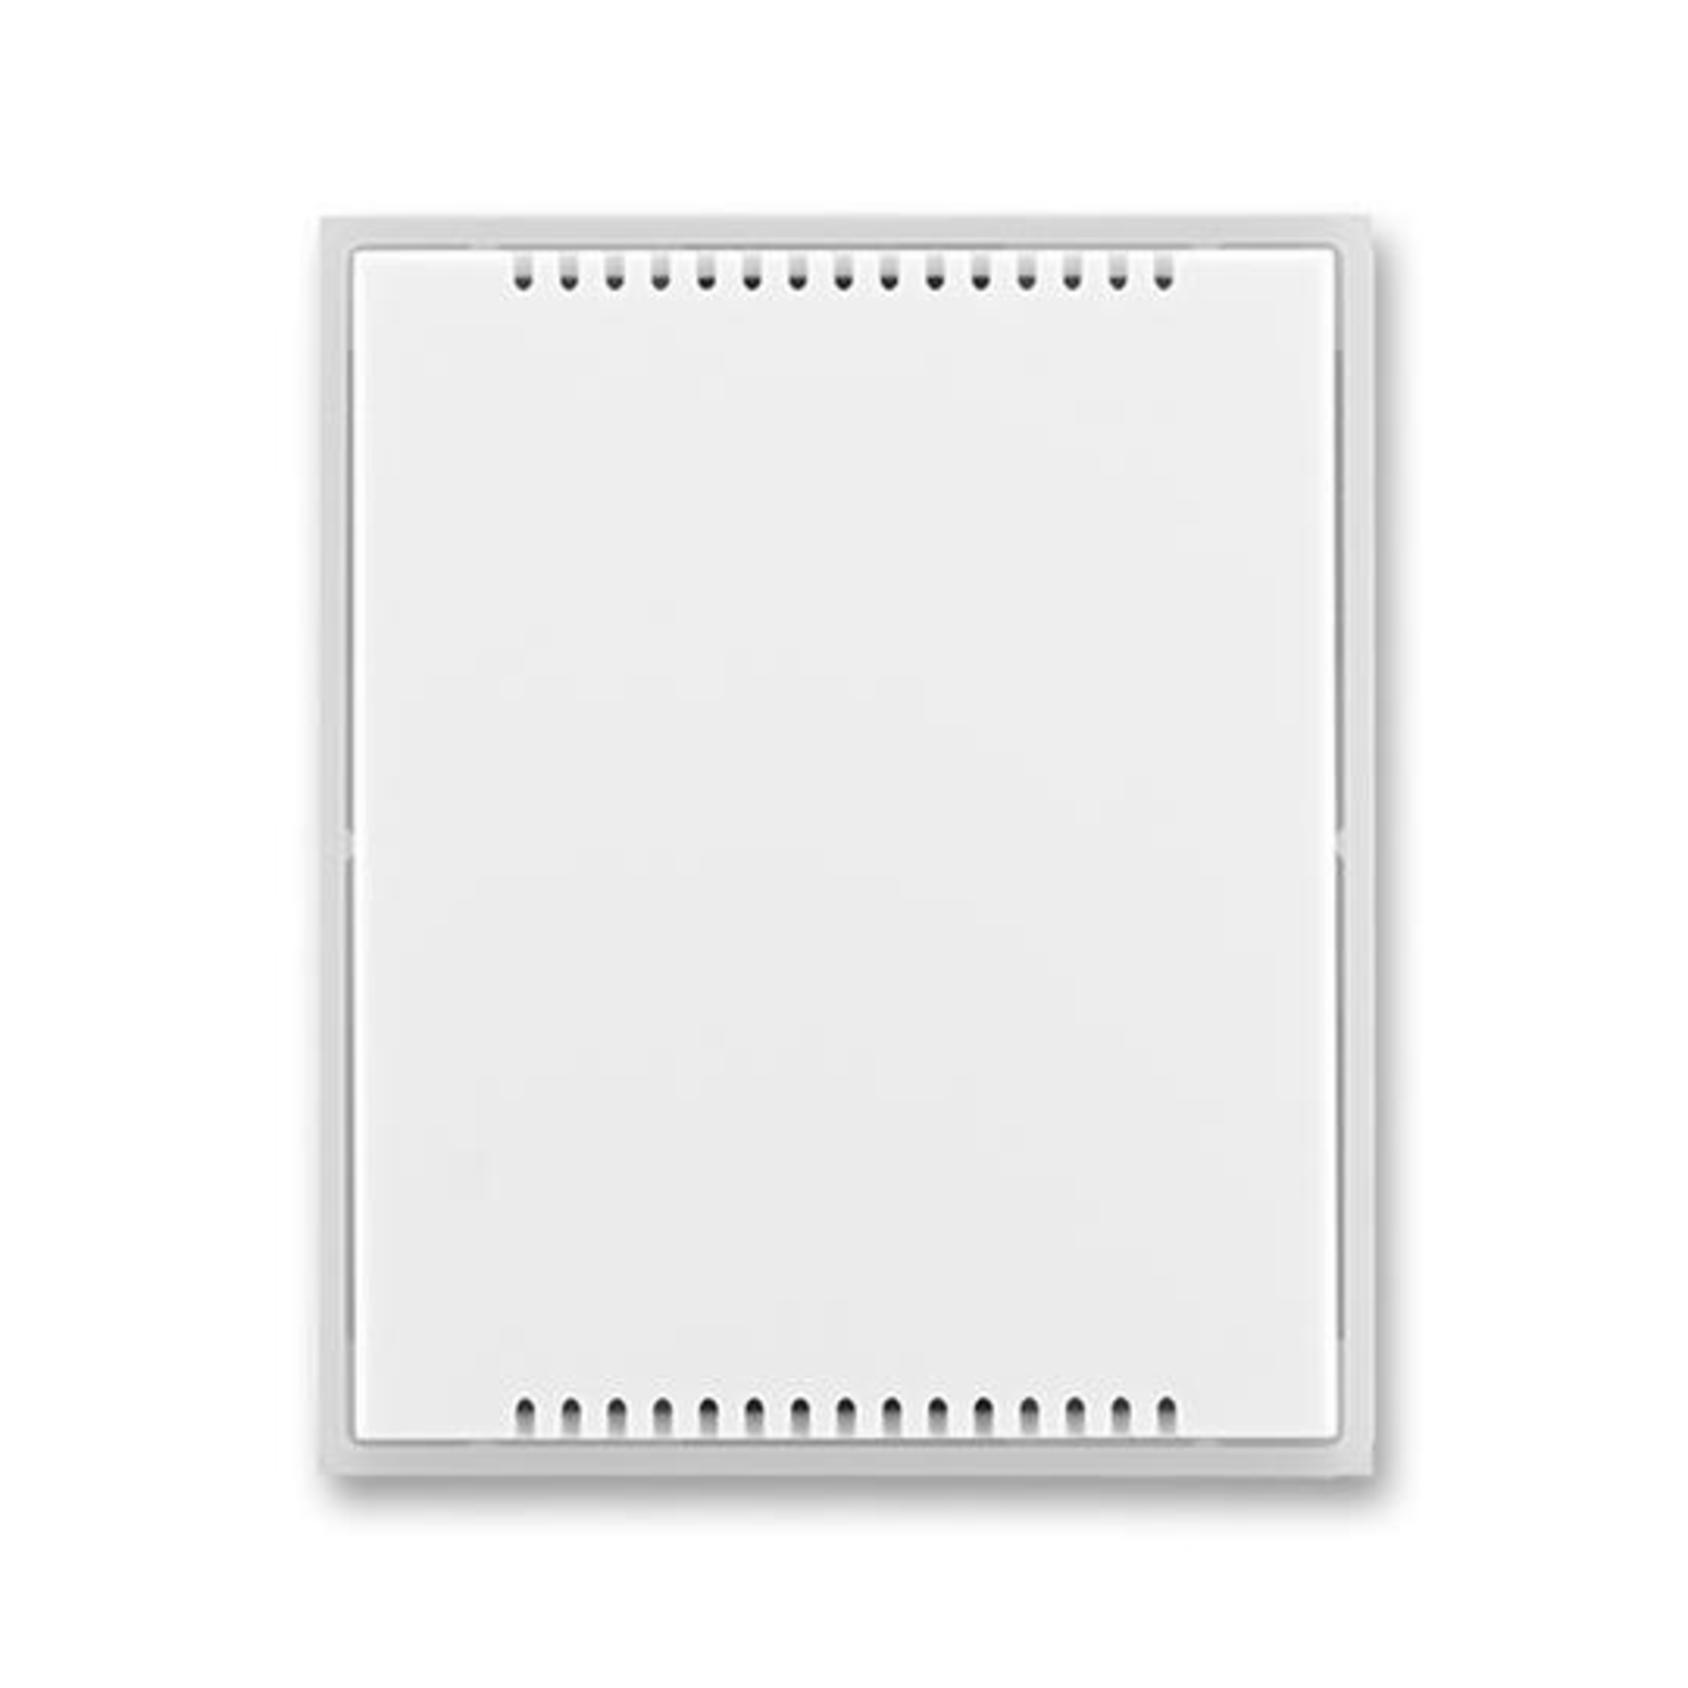 ABB 5015E-A00200 01 Element Kryt modulu stmívacího výkonového